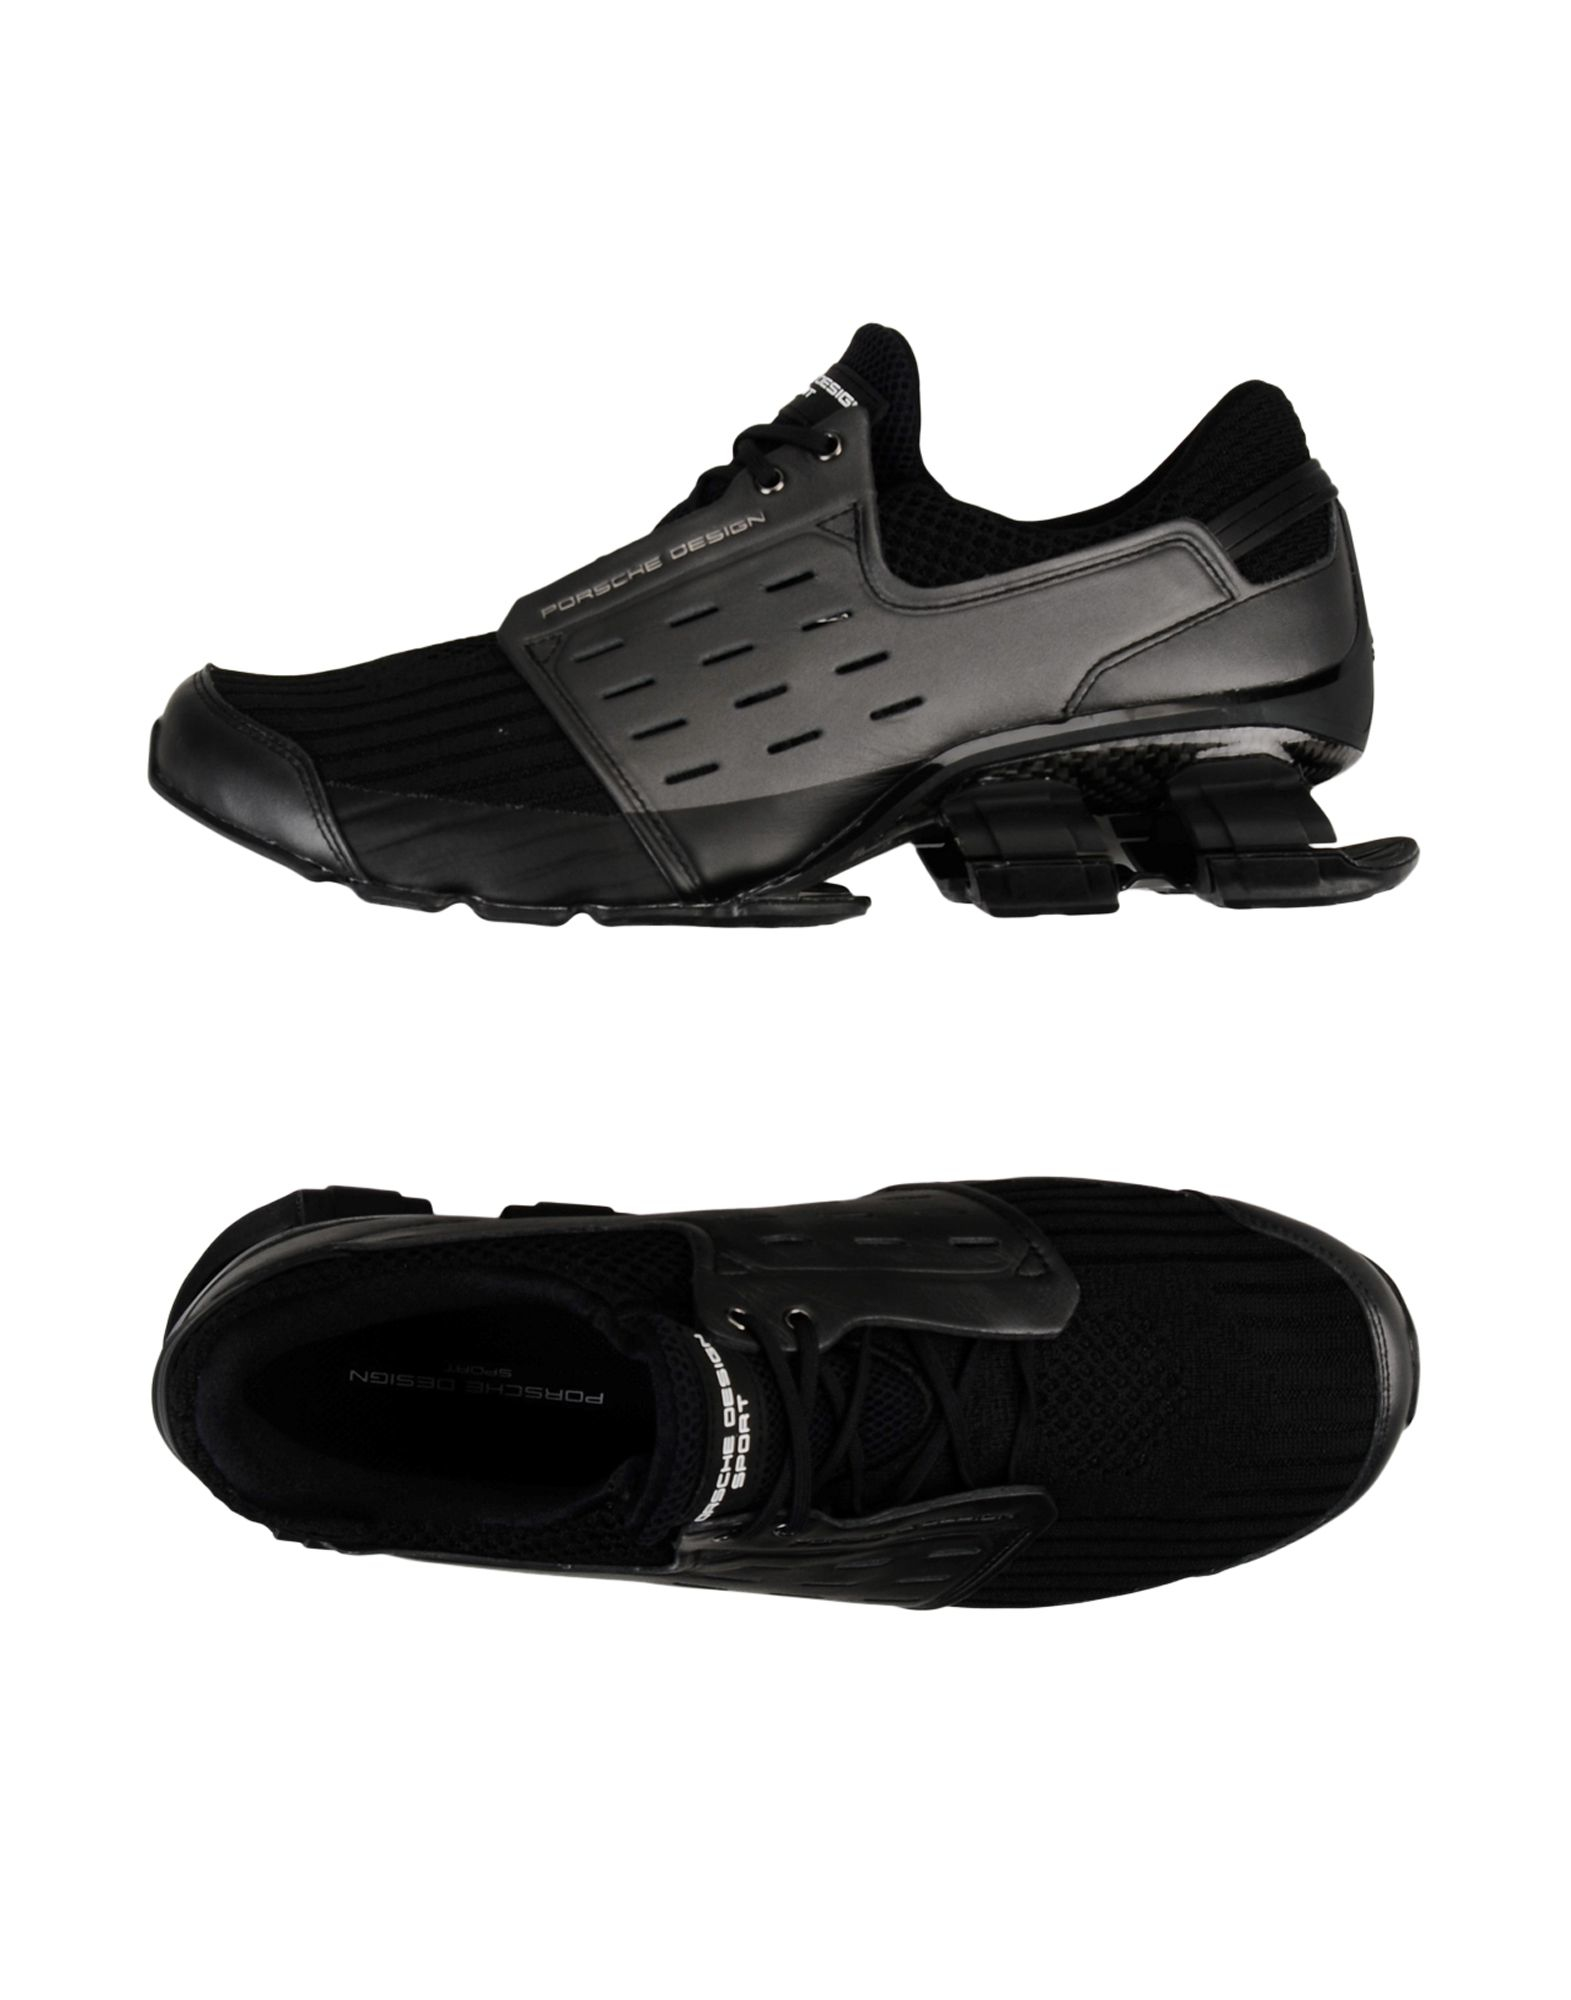 Adidas porsche design formatori vendita nello utah sneakeronline